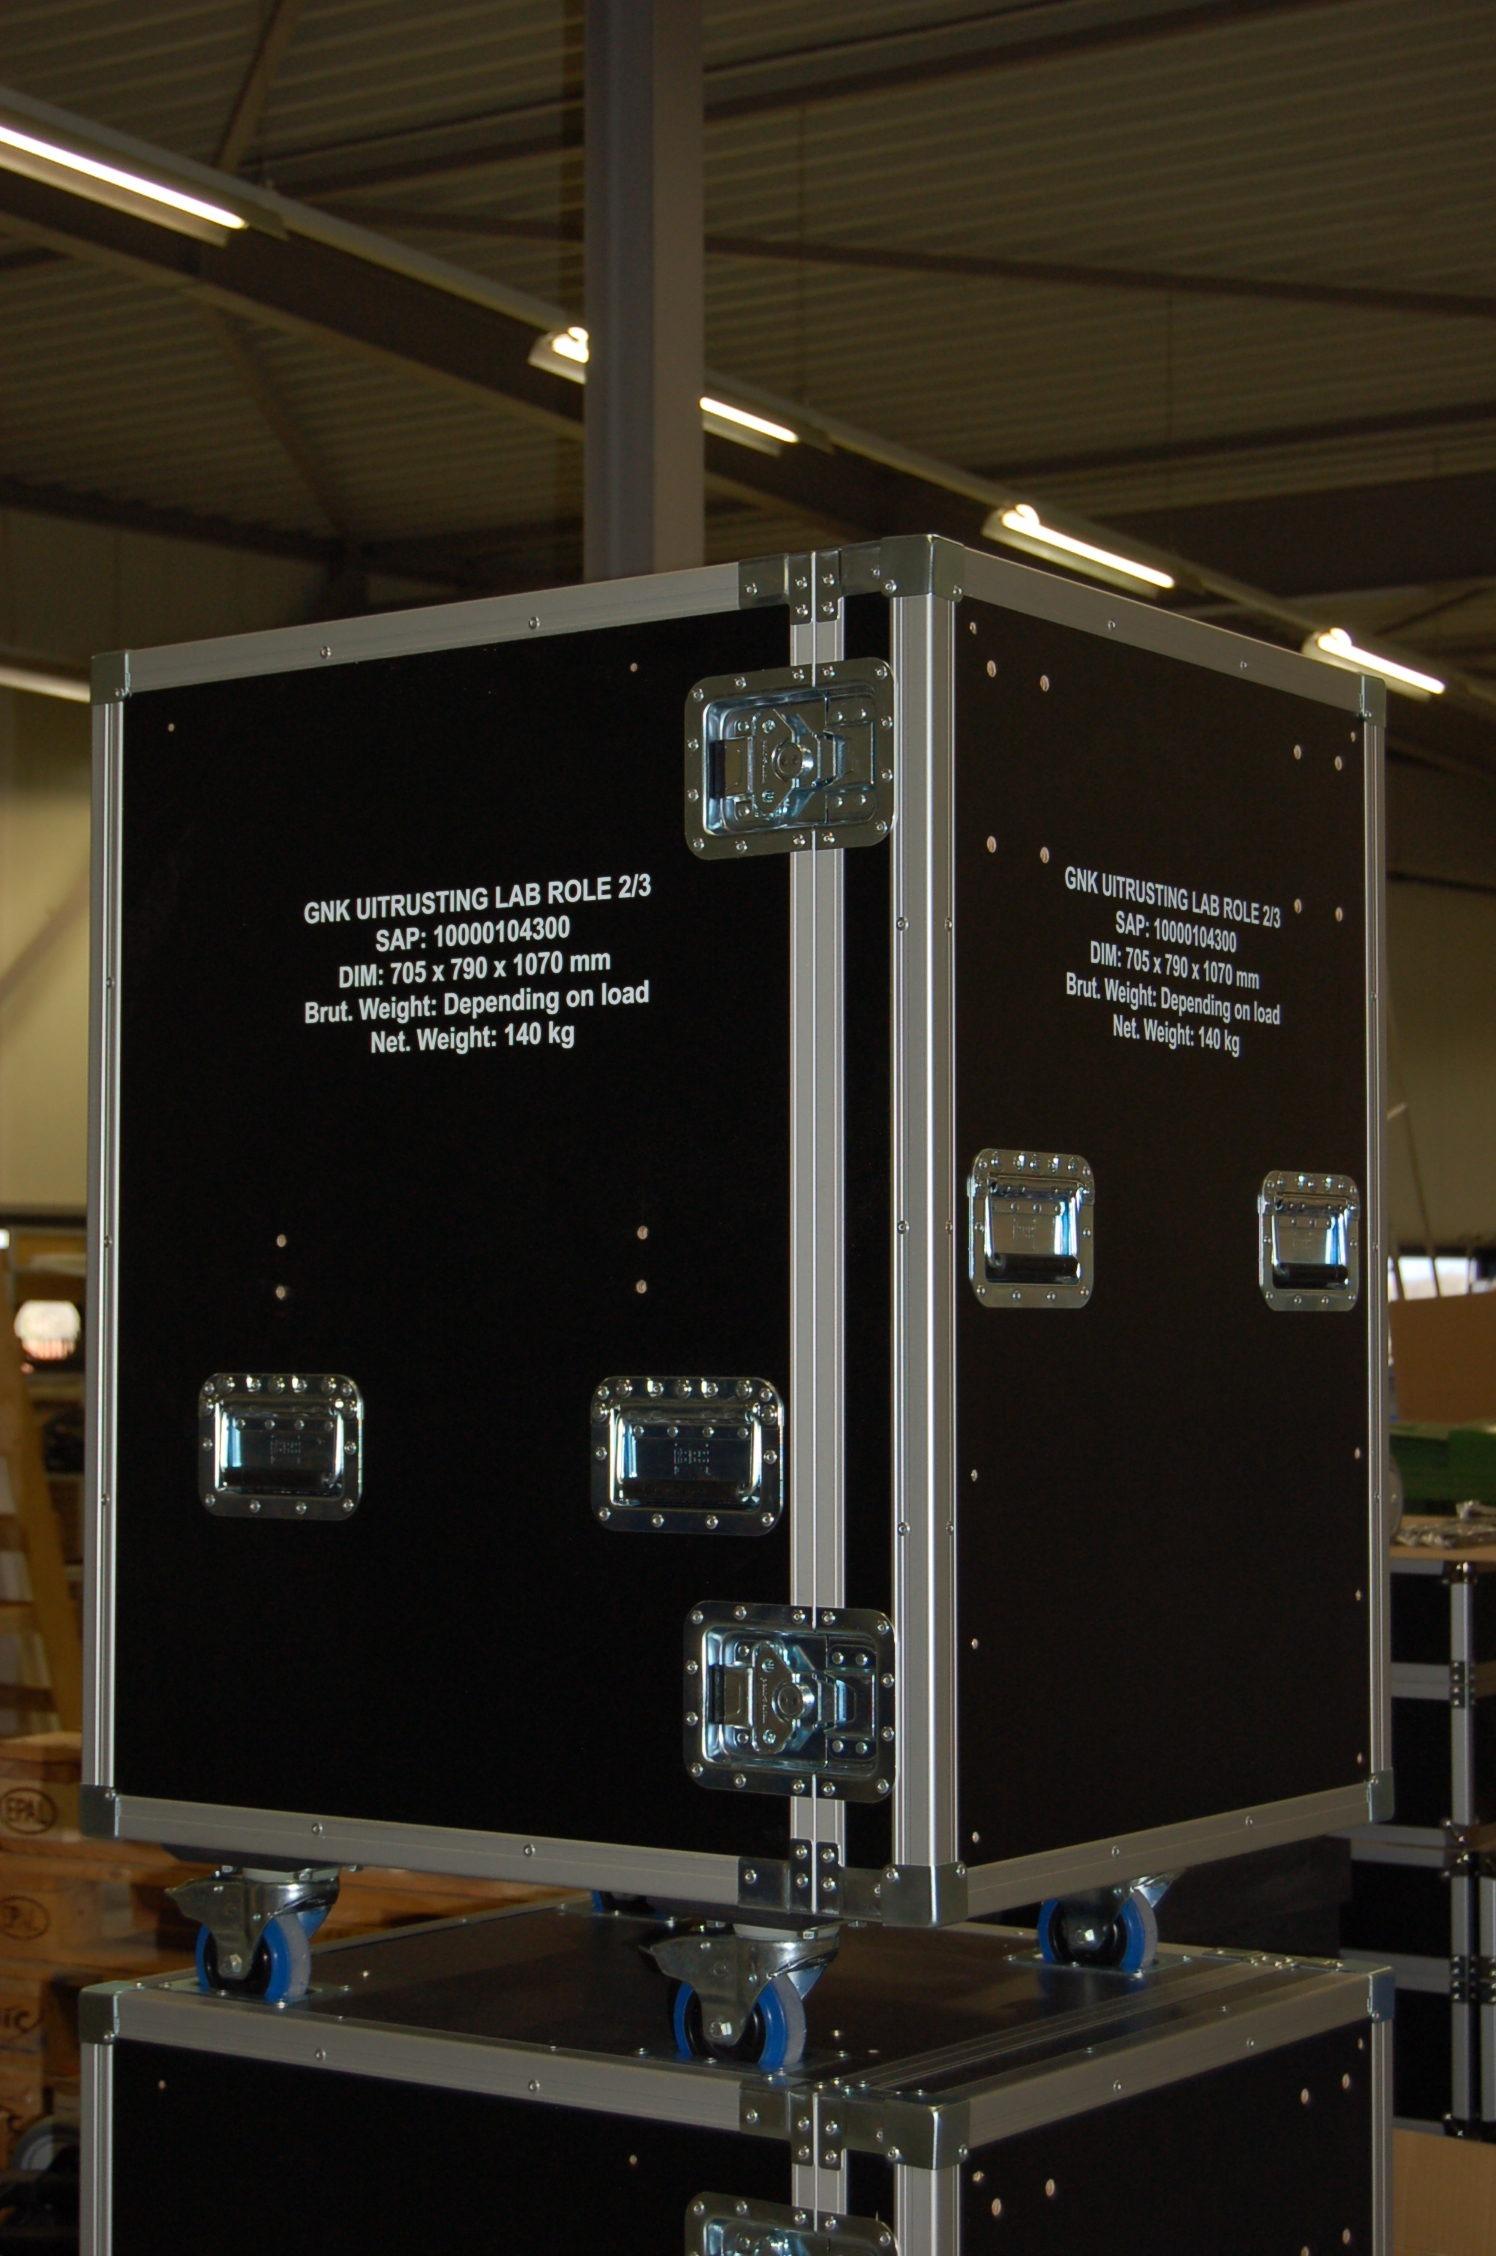 Defensie_GNK uitrusting-flightase-faes